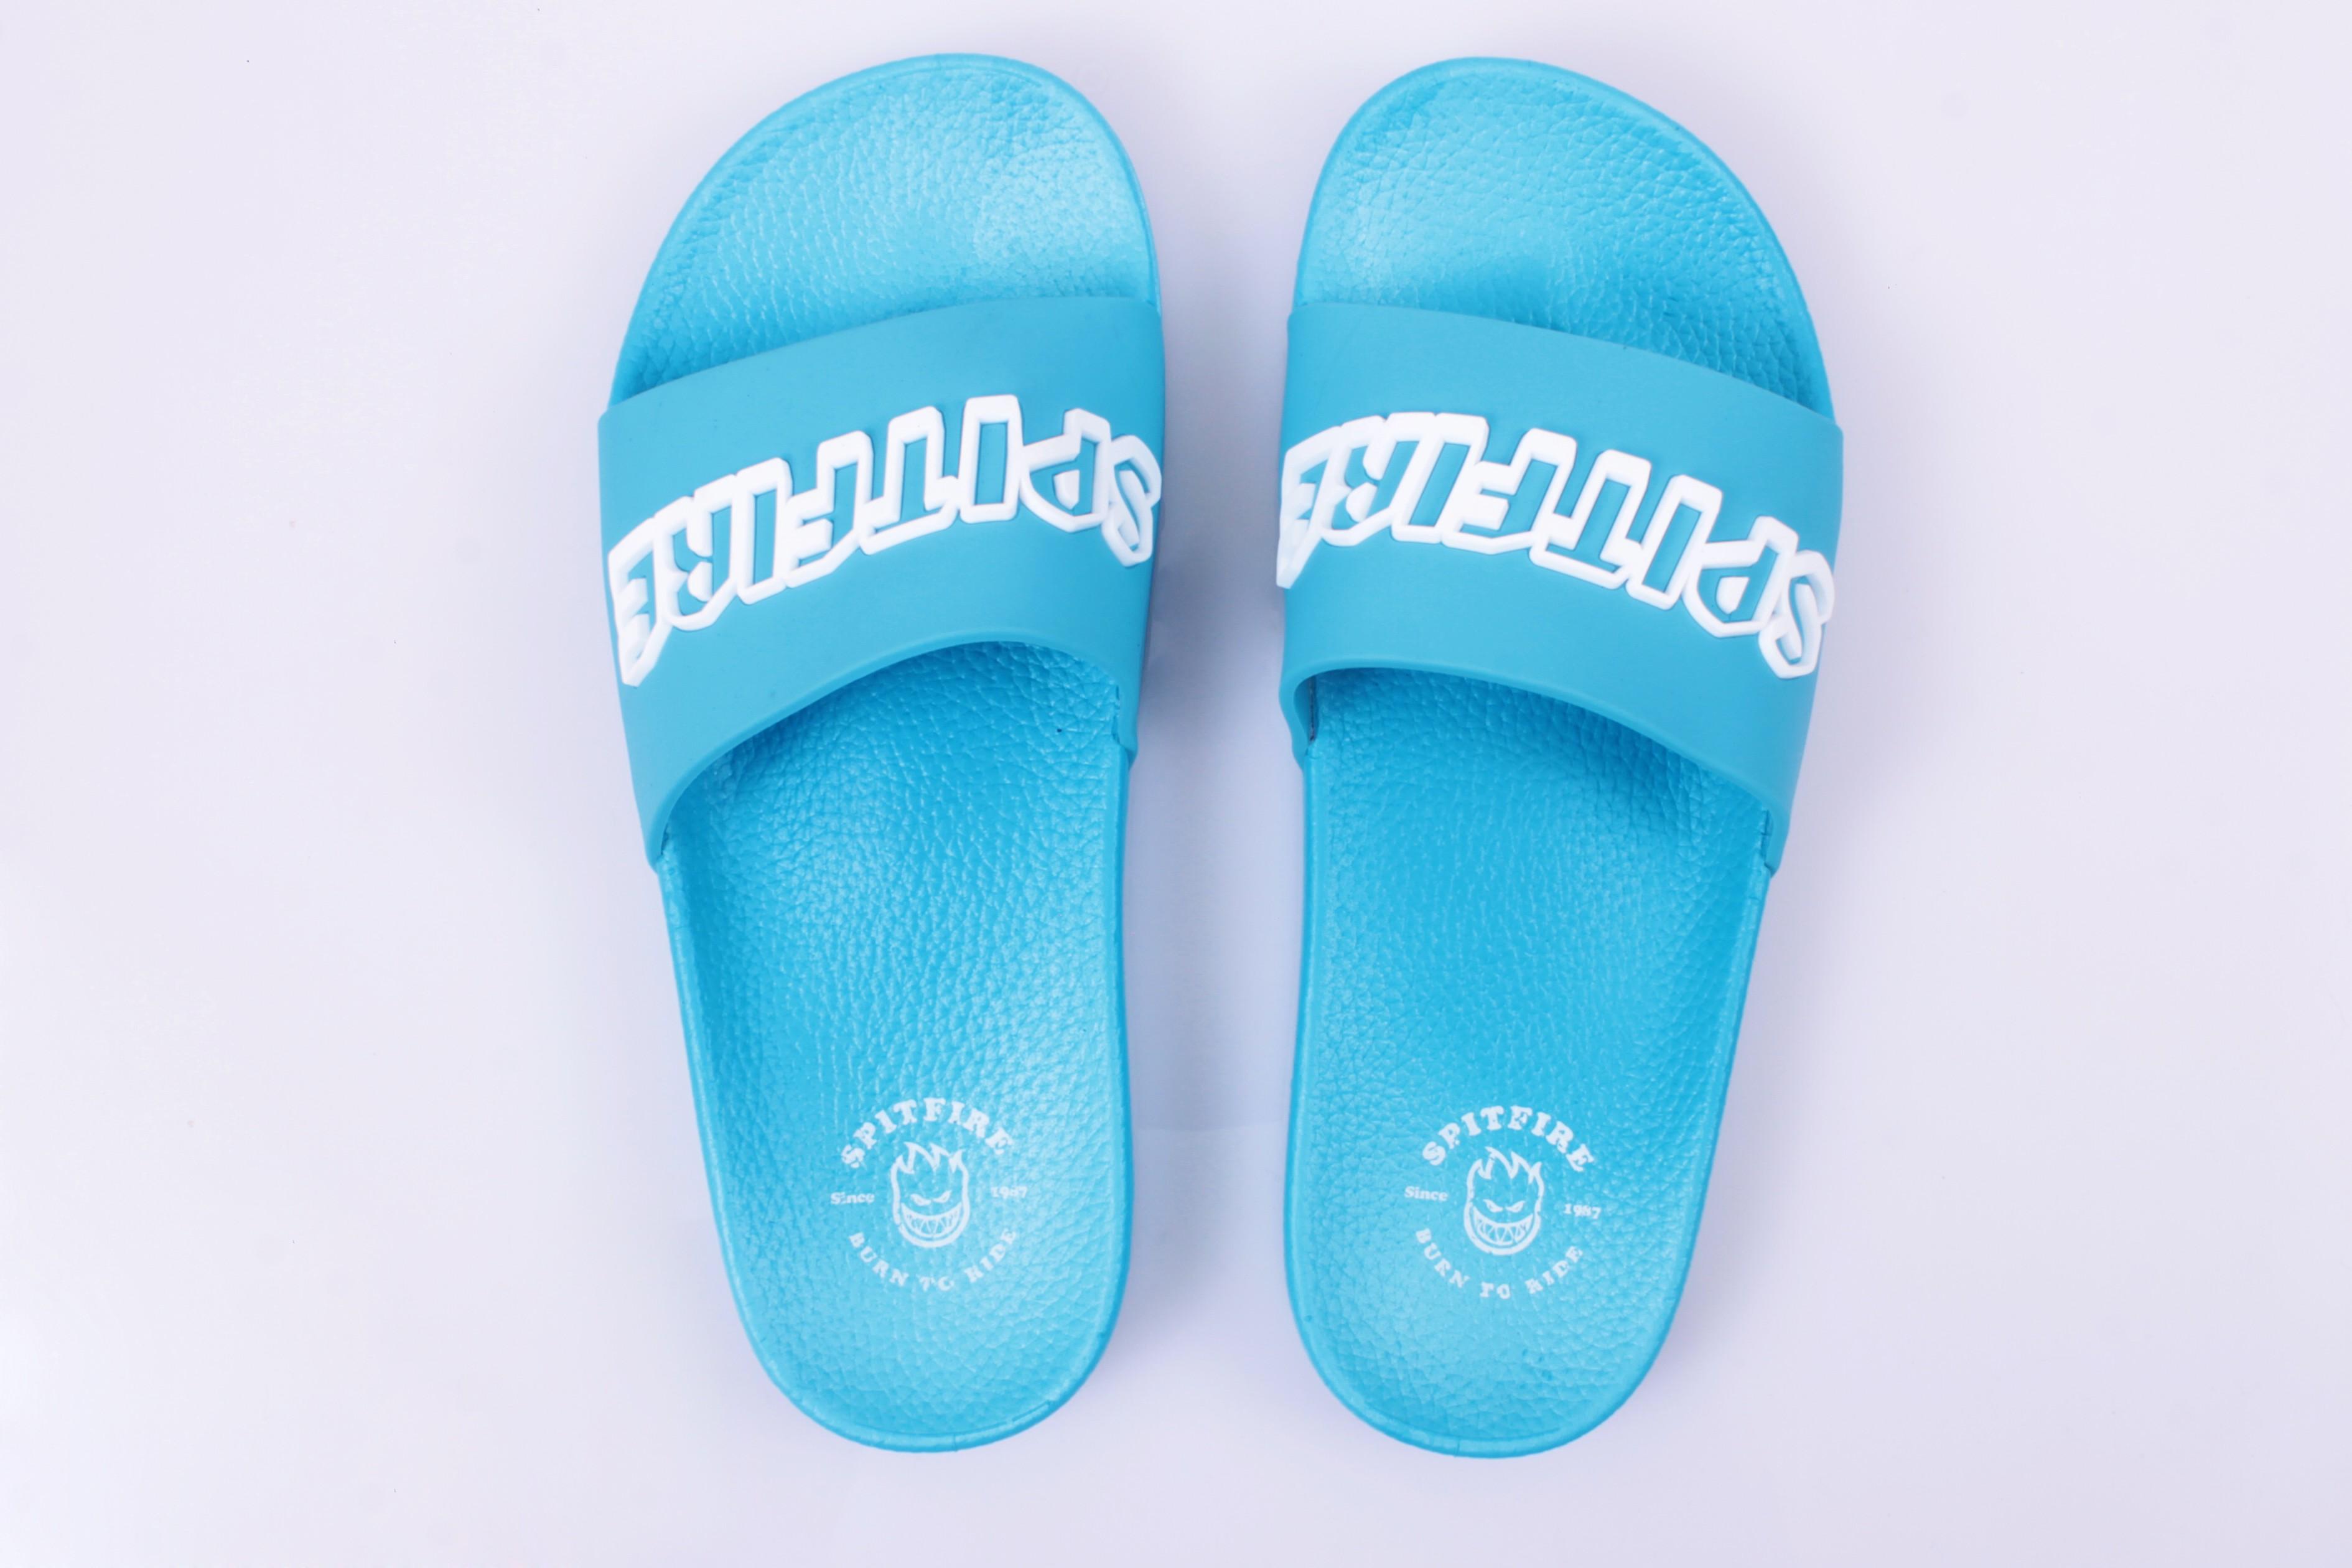 Sandalias de Mujer Line Spitfire Flip-Flop turquesa